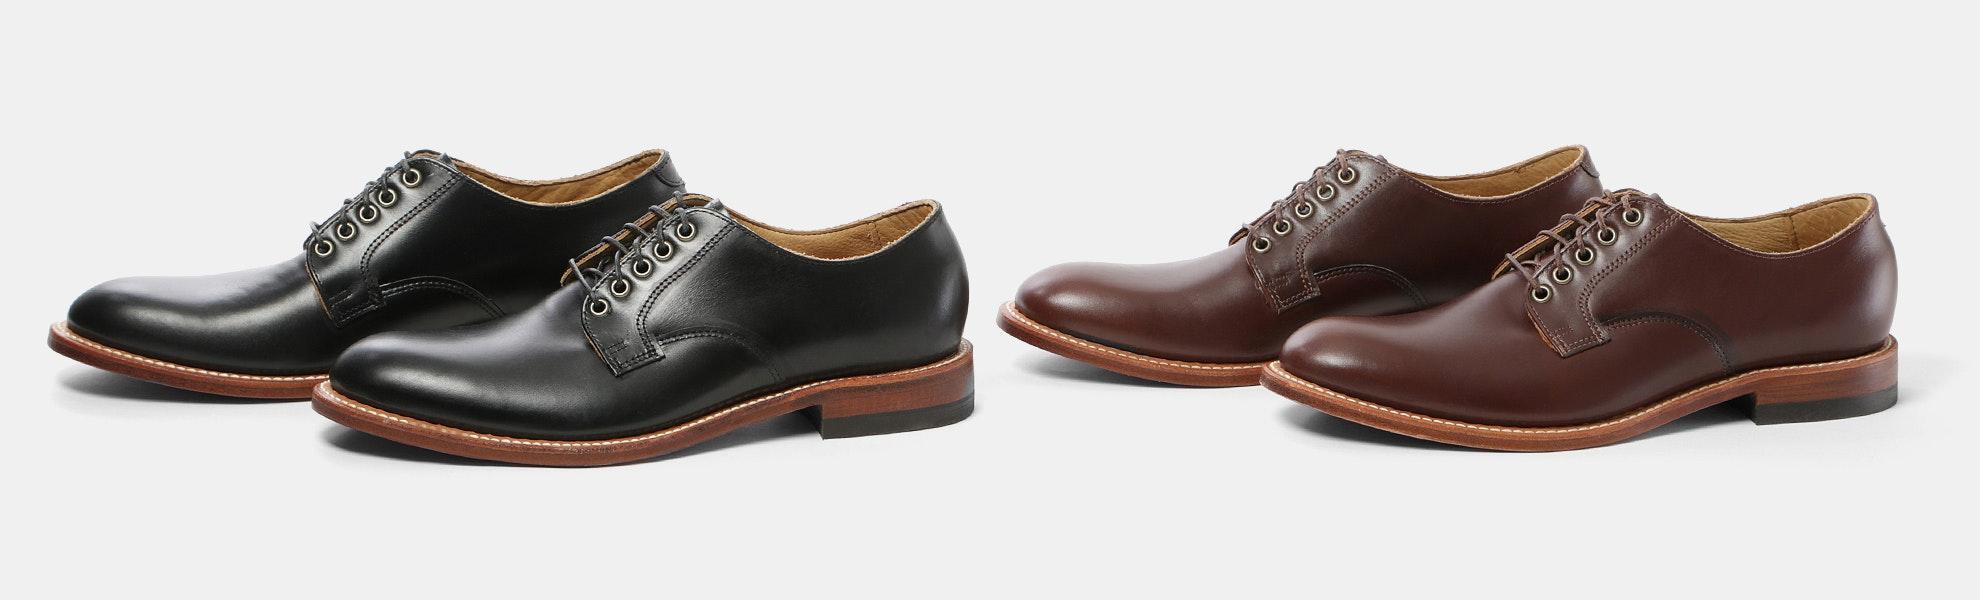 Oak Street Bootmakers Blucher – Massdrop Exclusive